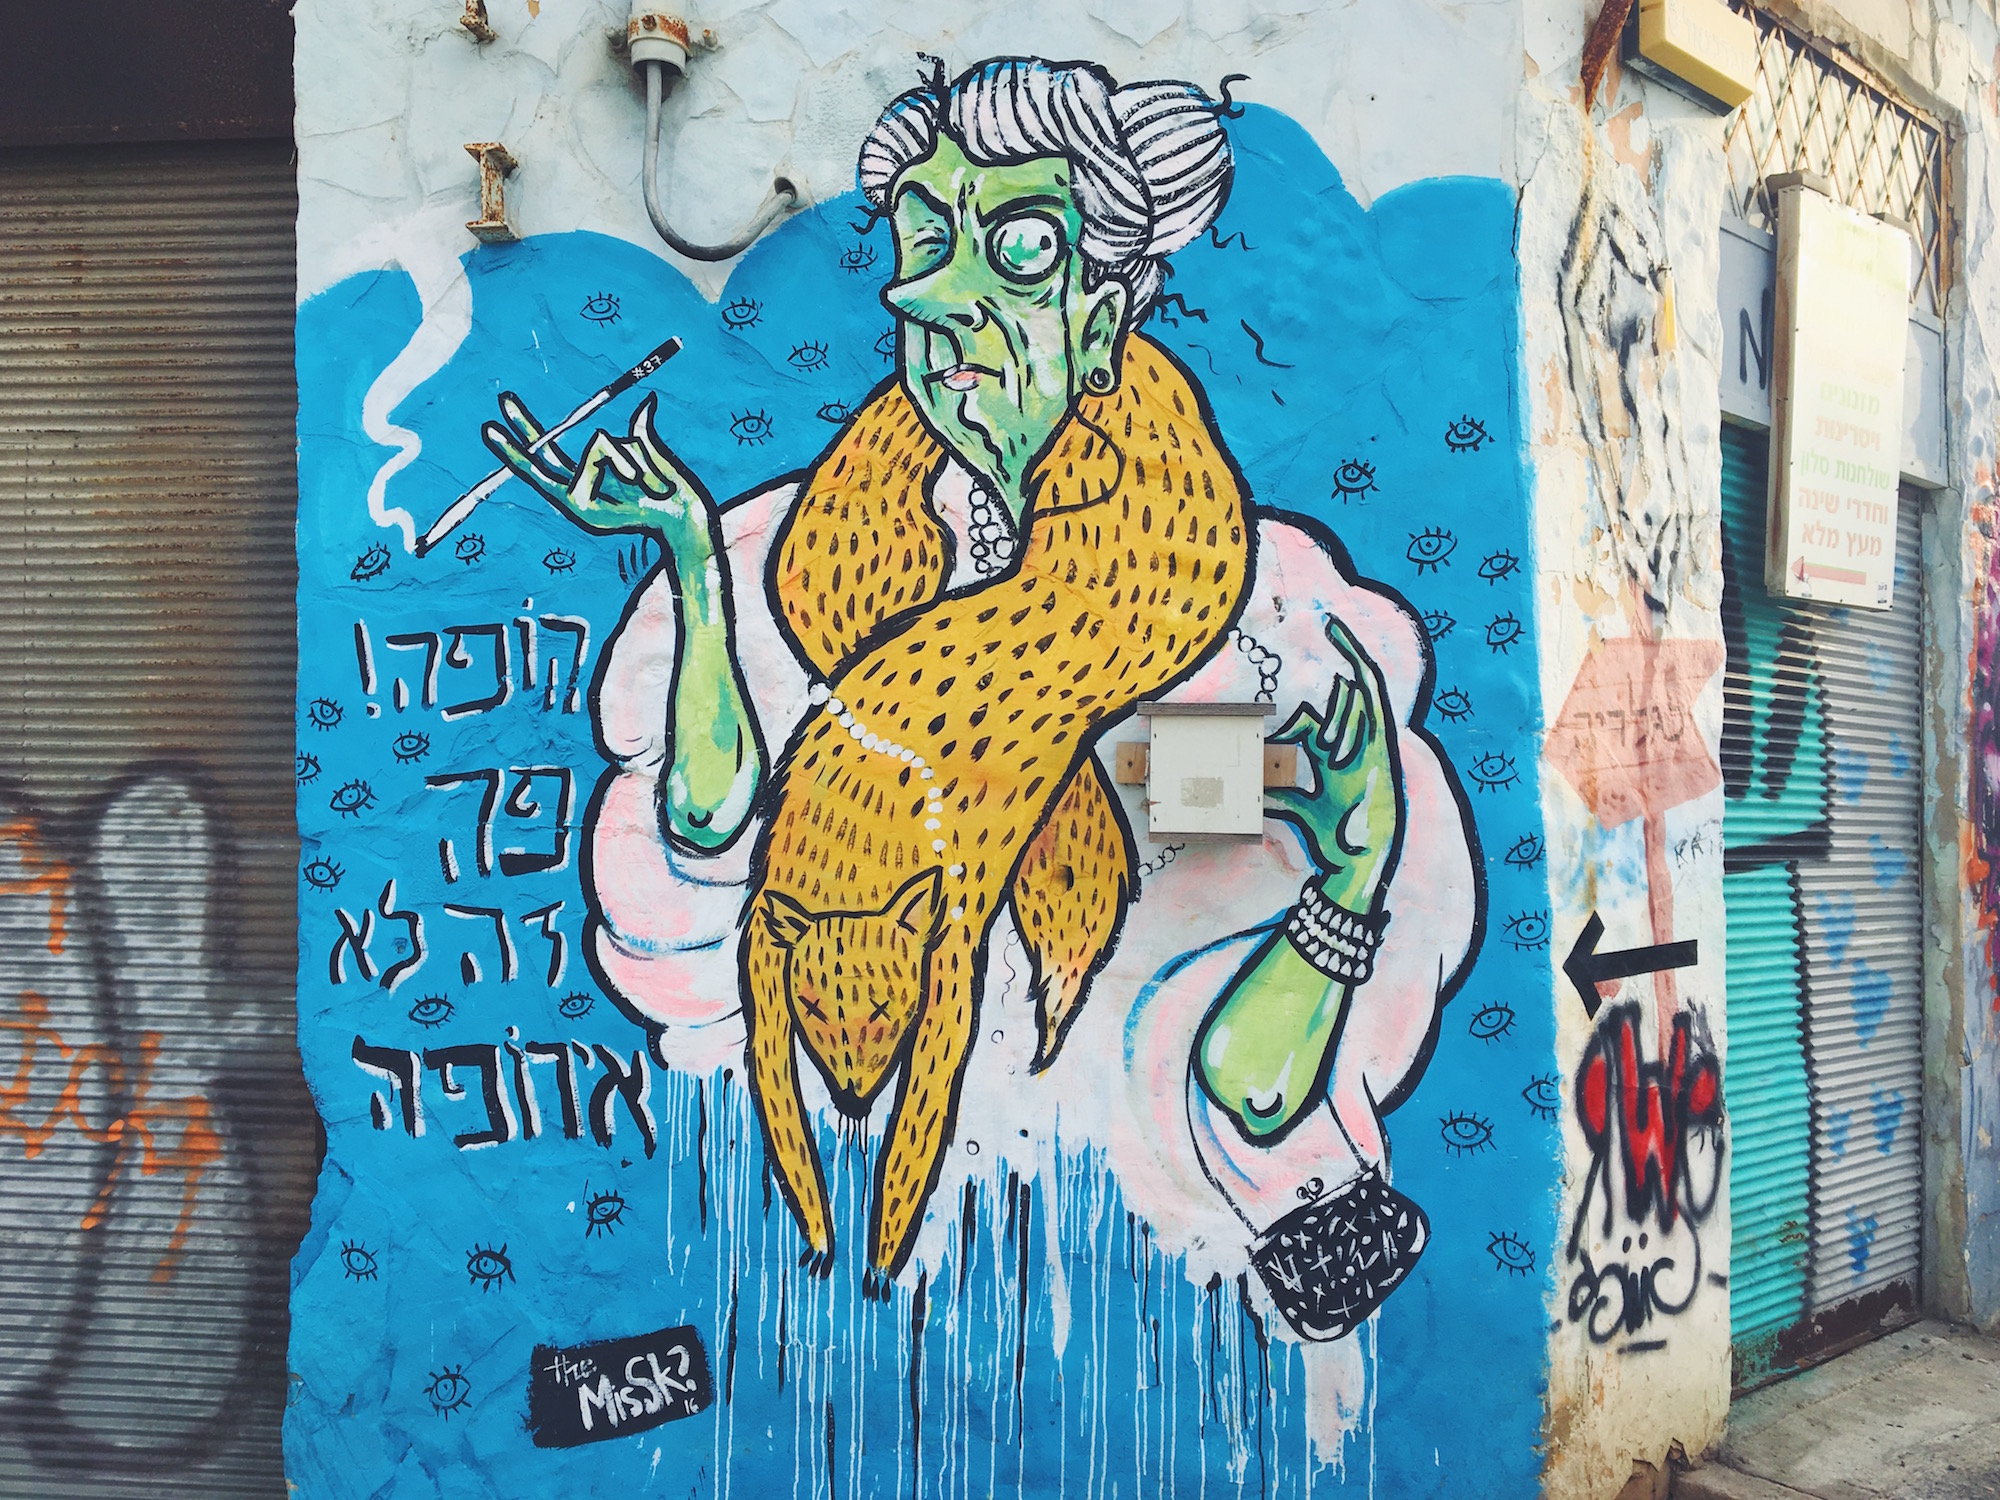 Quartiere Florentin a Tel Aviv - graffiti e murales